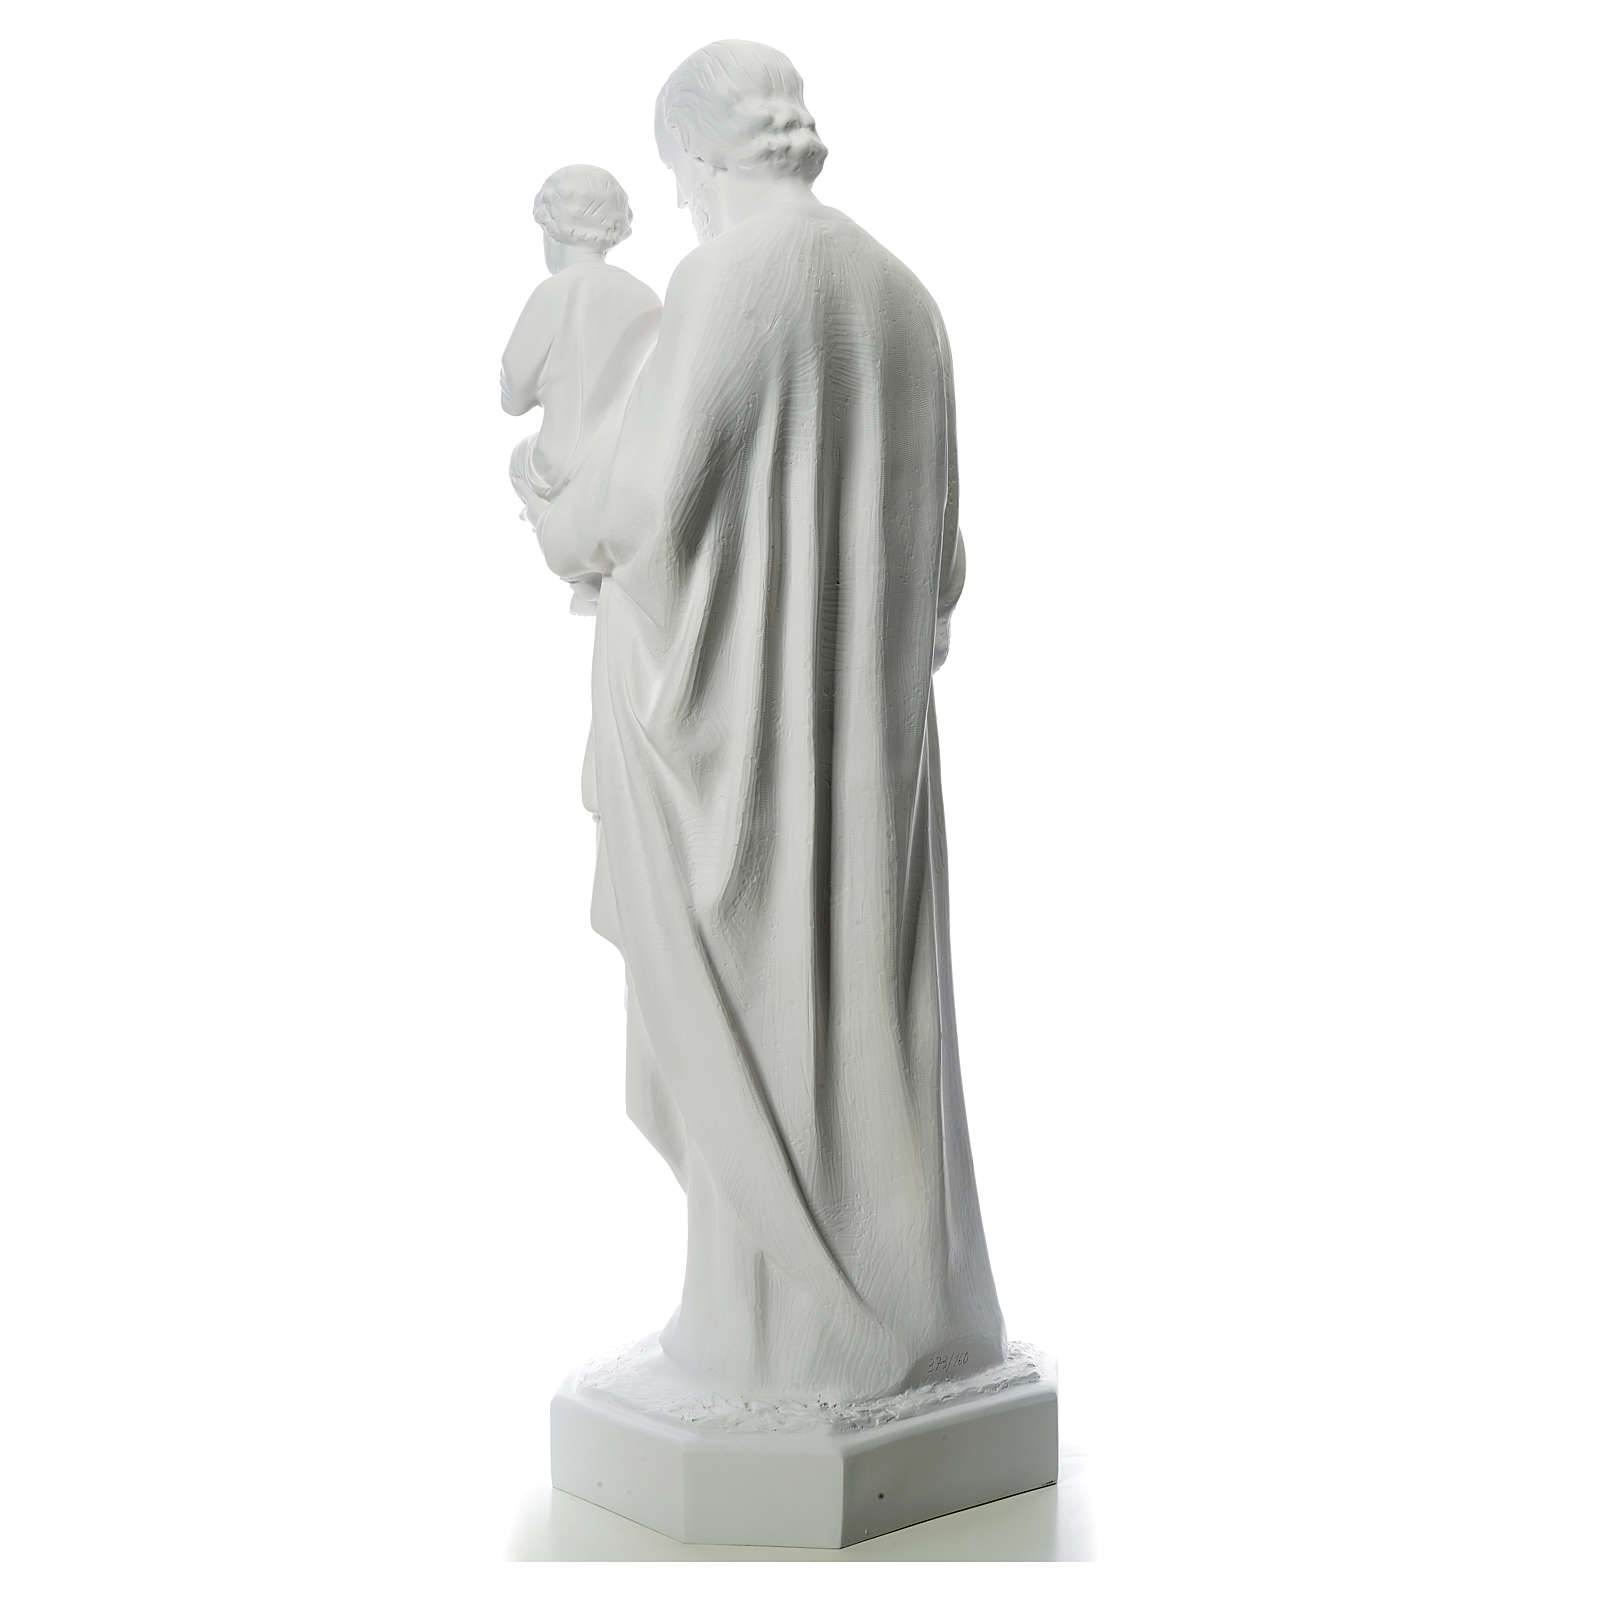 Statua San Giuseppe 160 cm vetroresina bianca 4